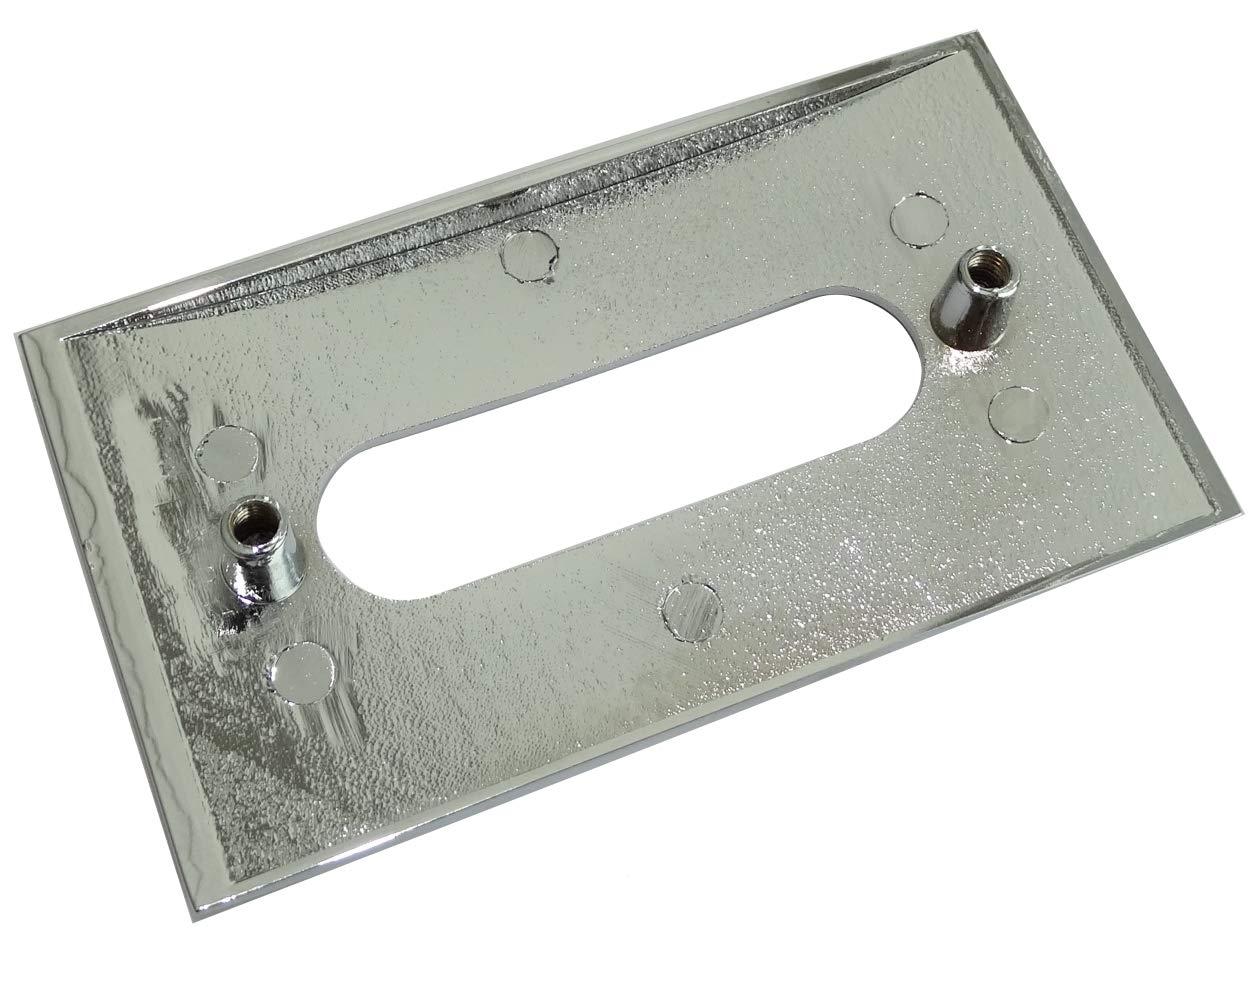 10x Tirador para caj/ón alacena puerta mueble armario Rioni cromo 96mm C41429 AERZETIX